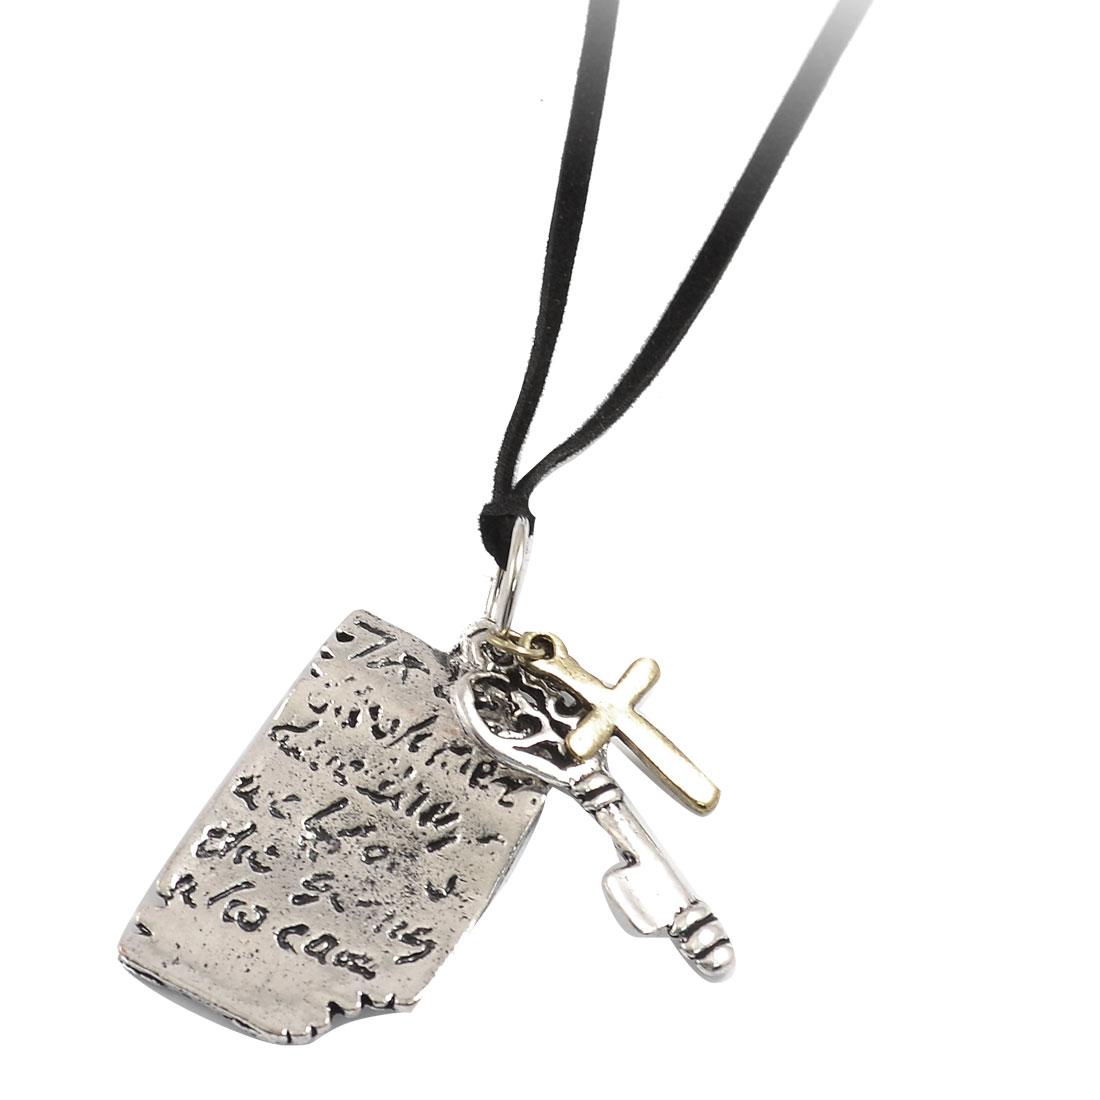 Woman Silver Tone Metal Plate Key Pendant Black String Necklace